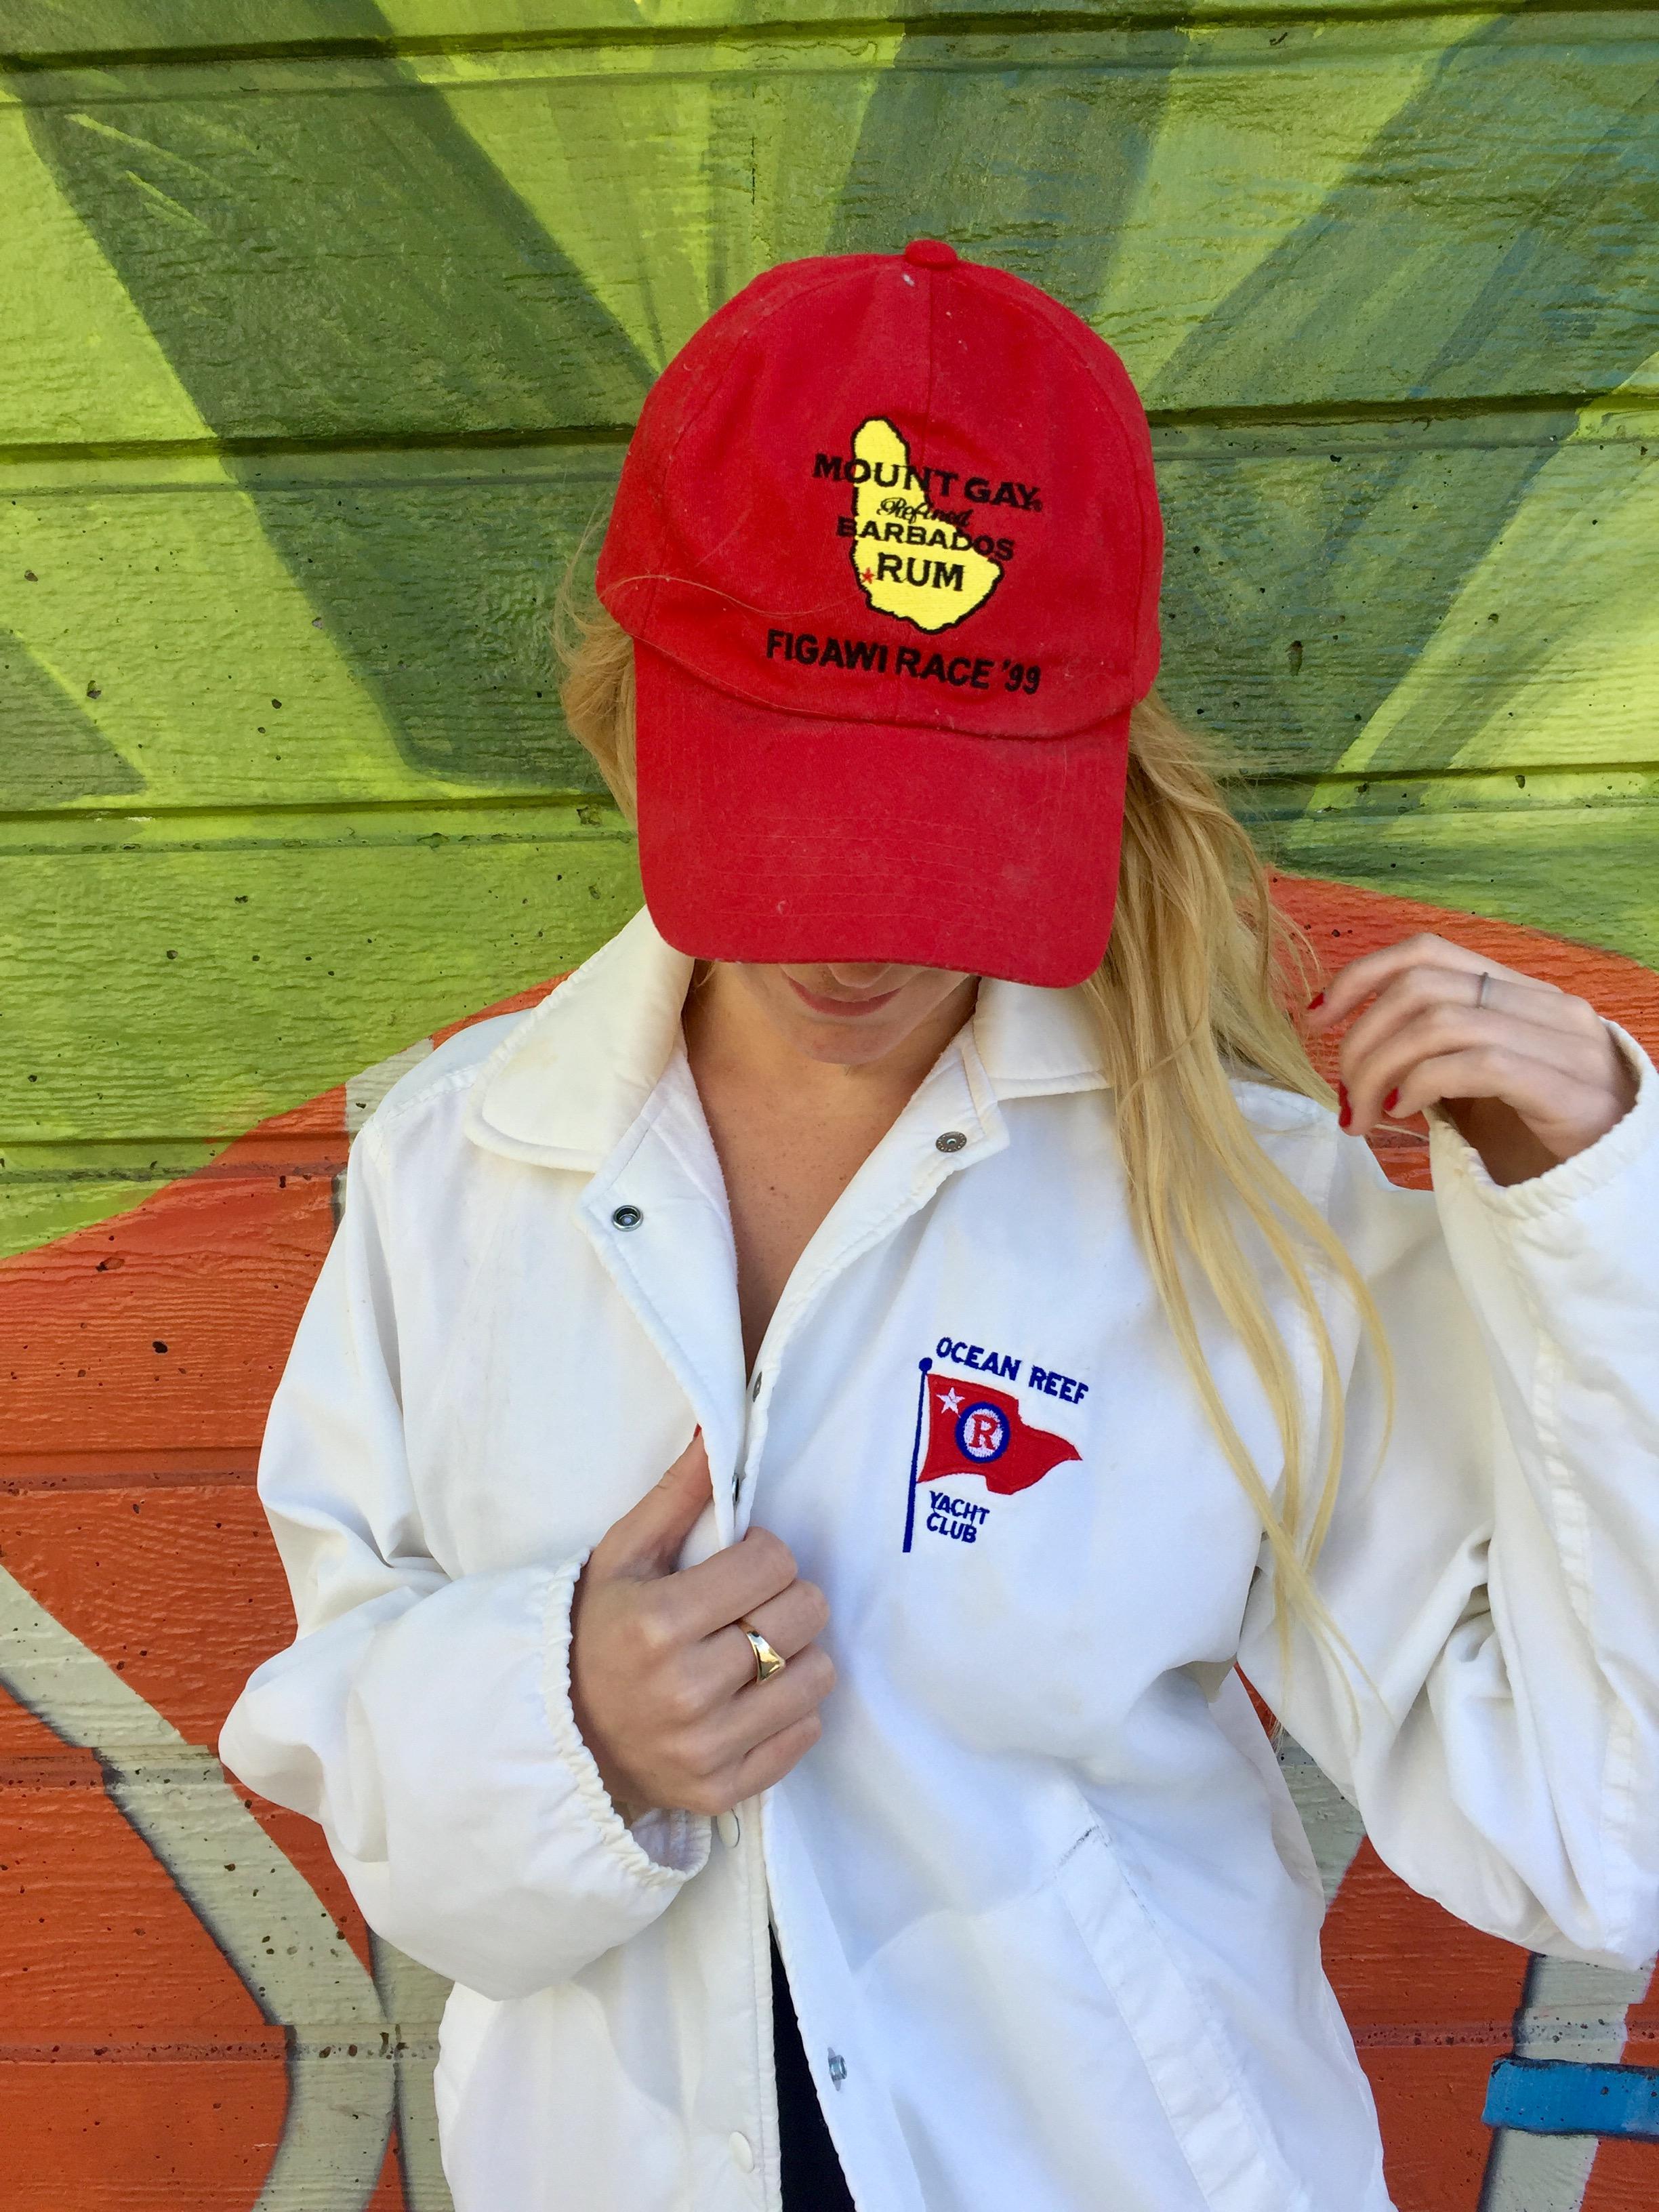 Hat and Jacket: Vintage